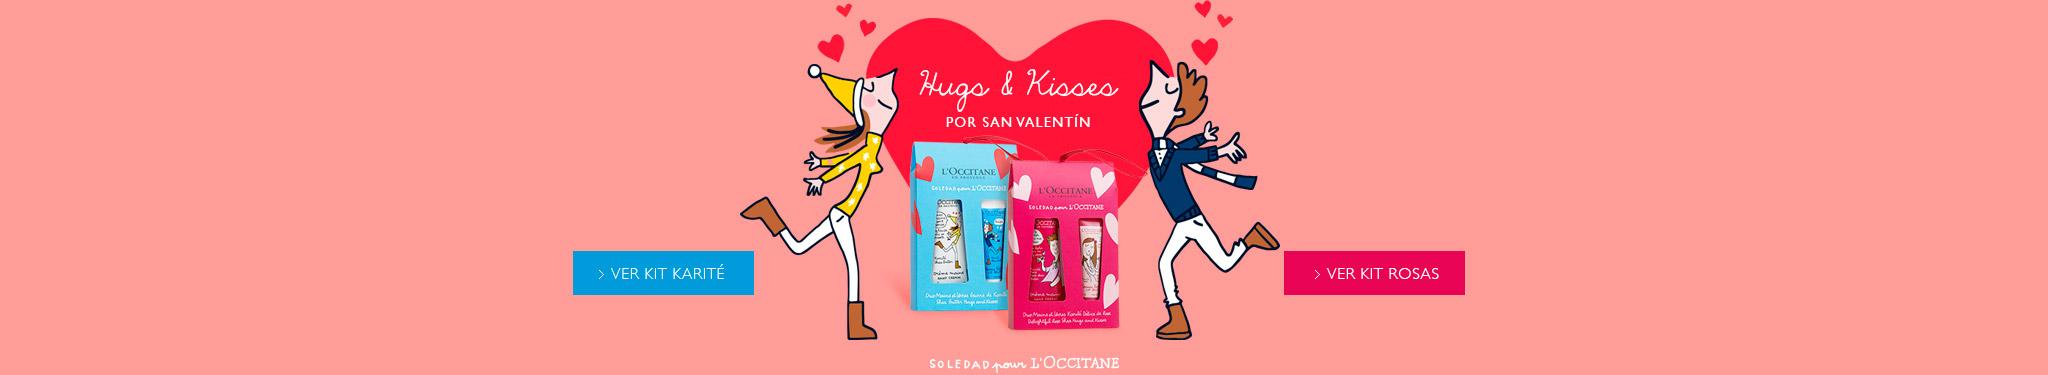 Hugs & Kisses por San Valentín